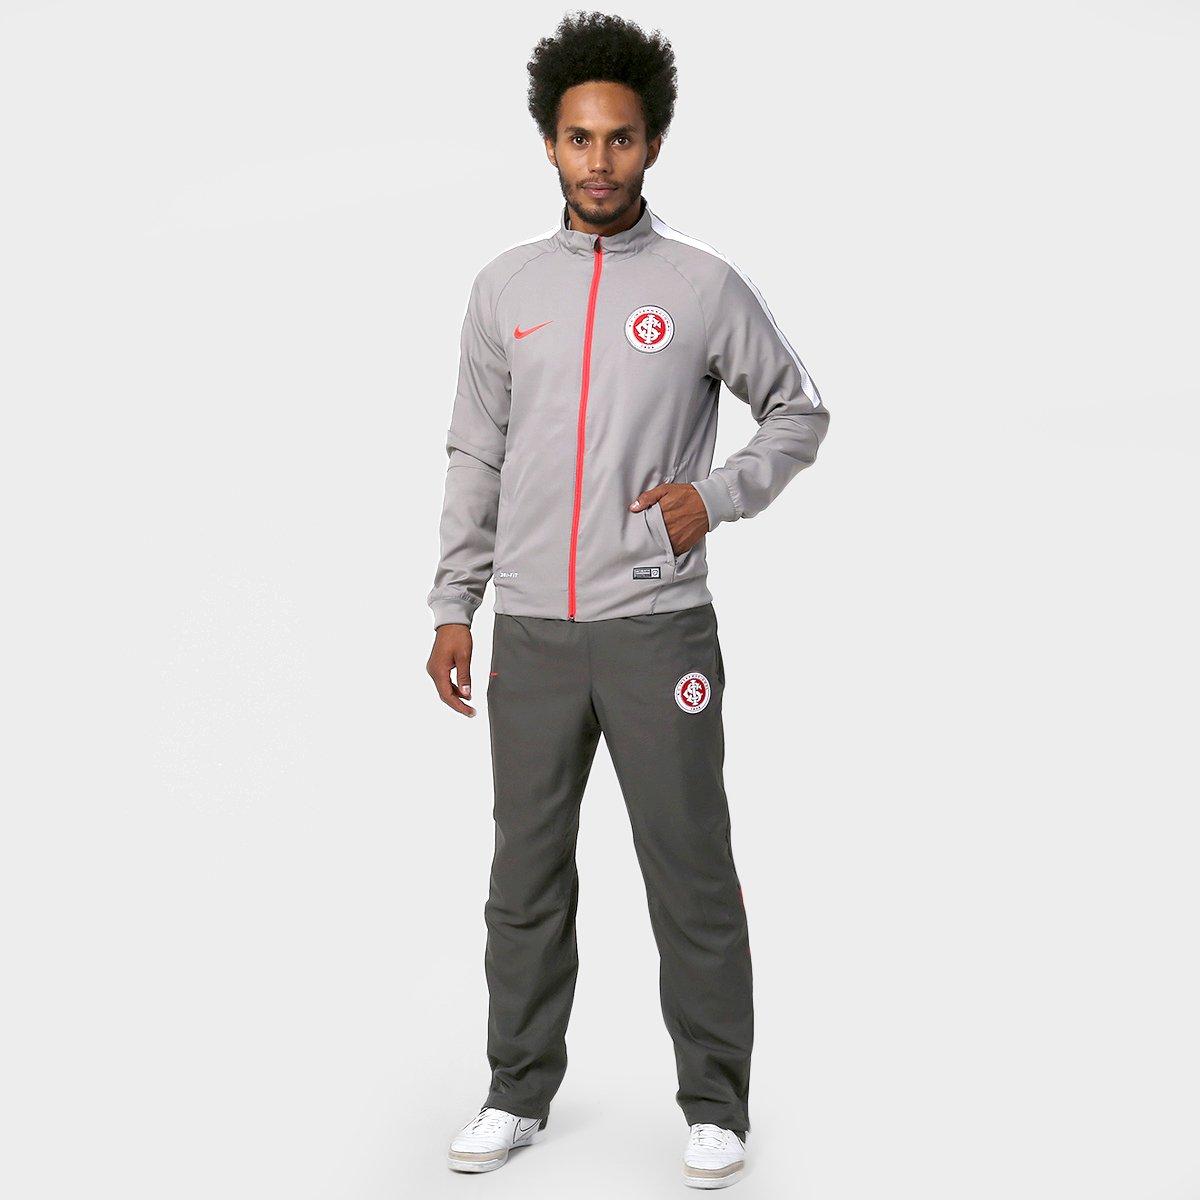 Agasalho Nike Internacional Squad Sideline Woven - Compre Agora ... f2dfe58e895ea